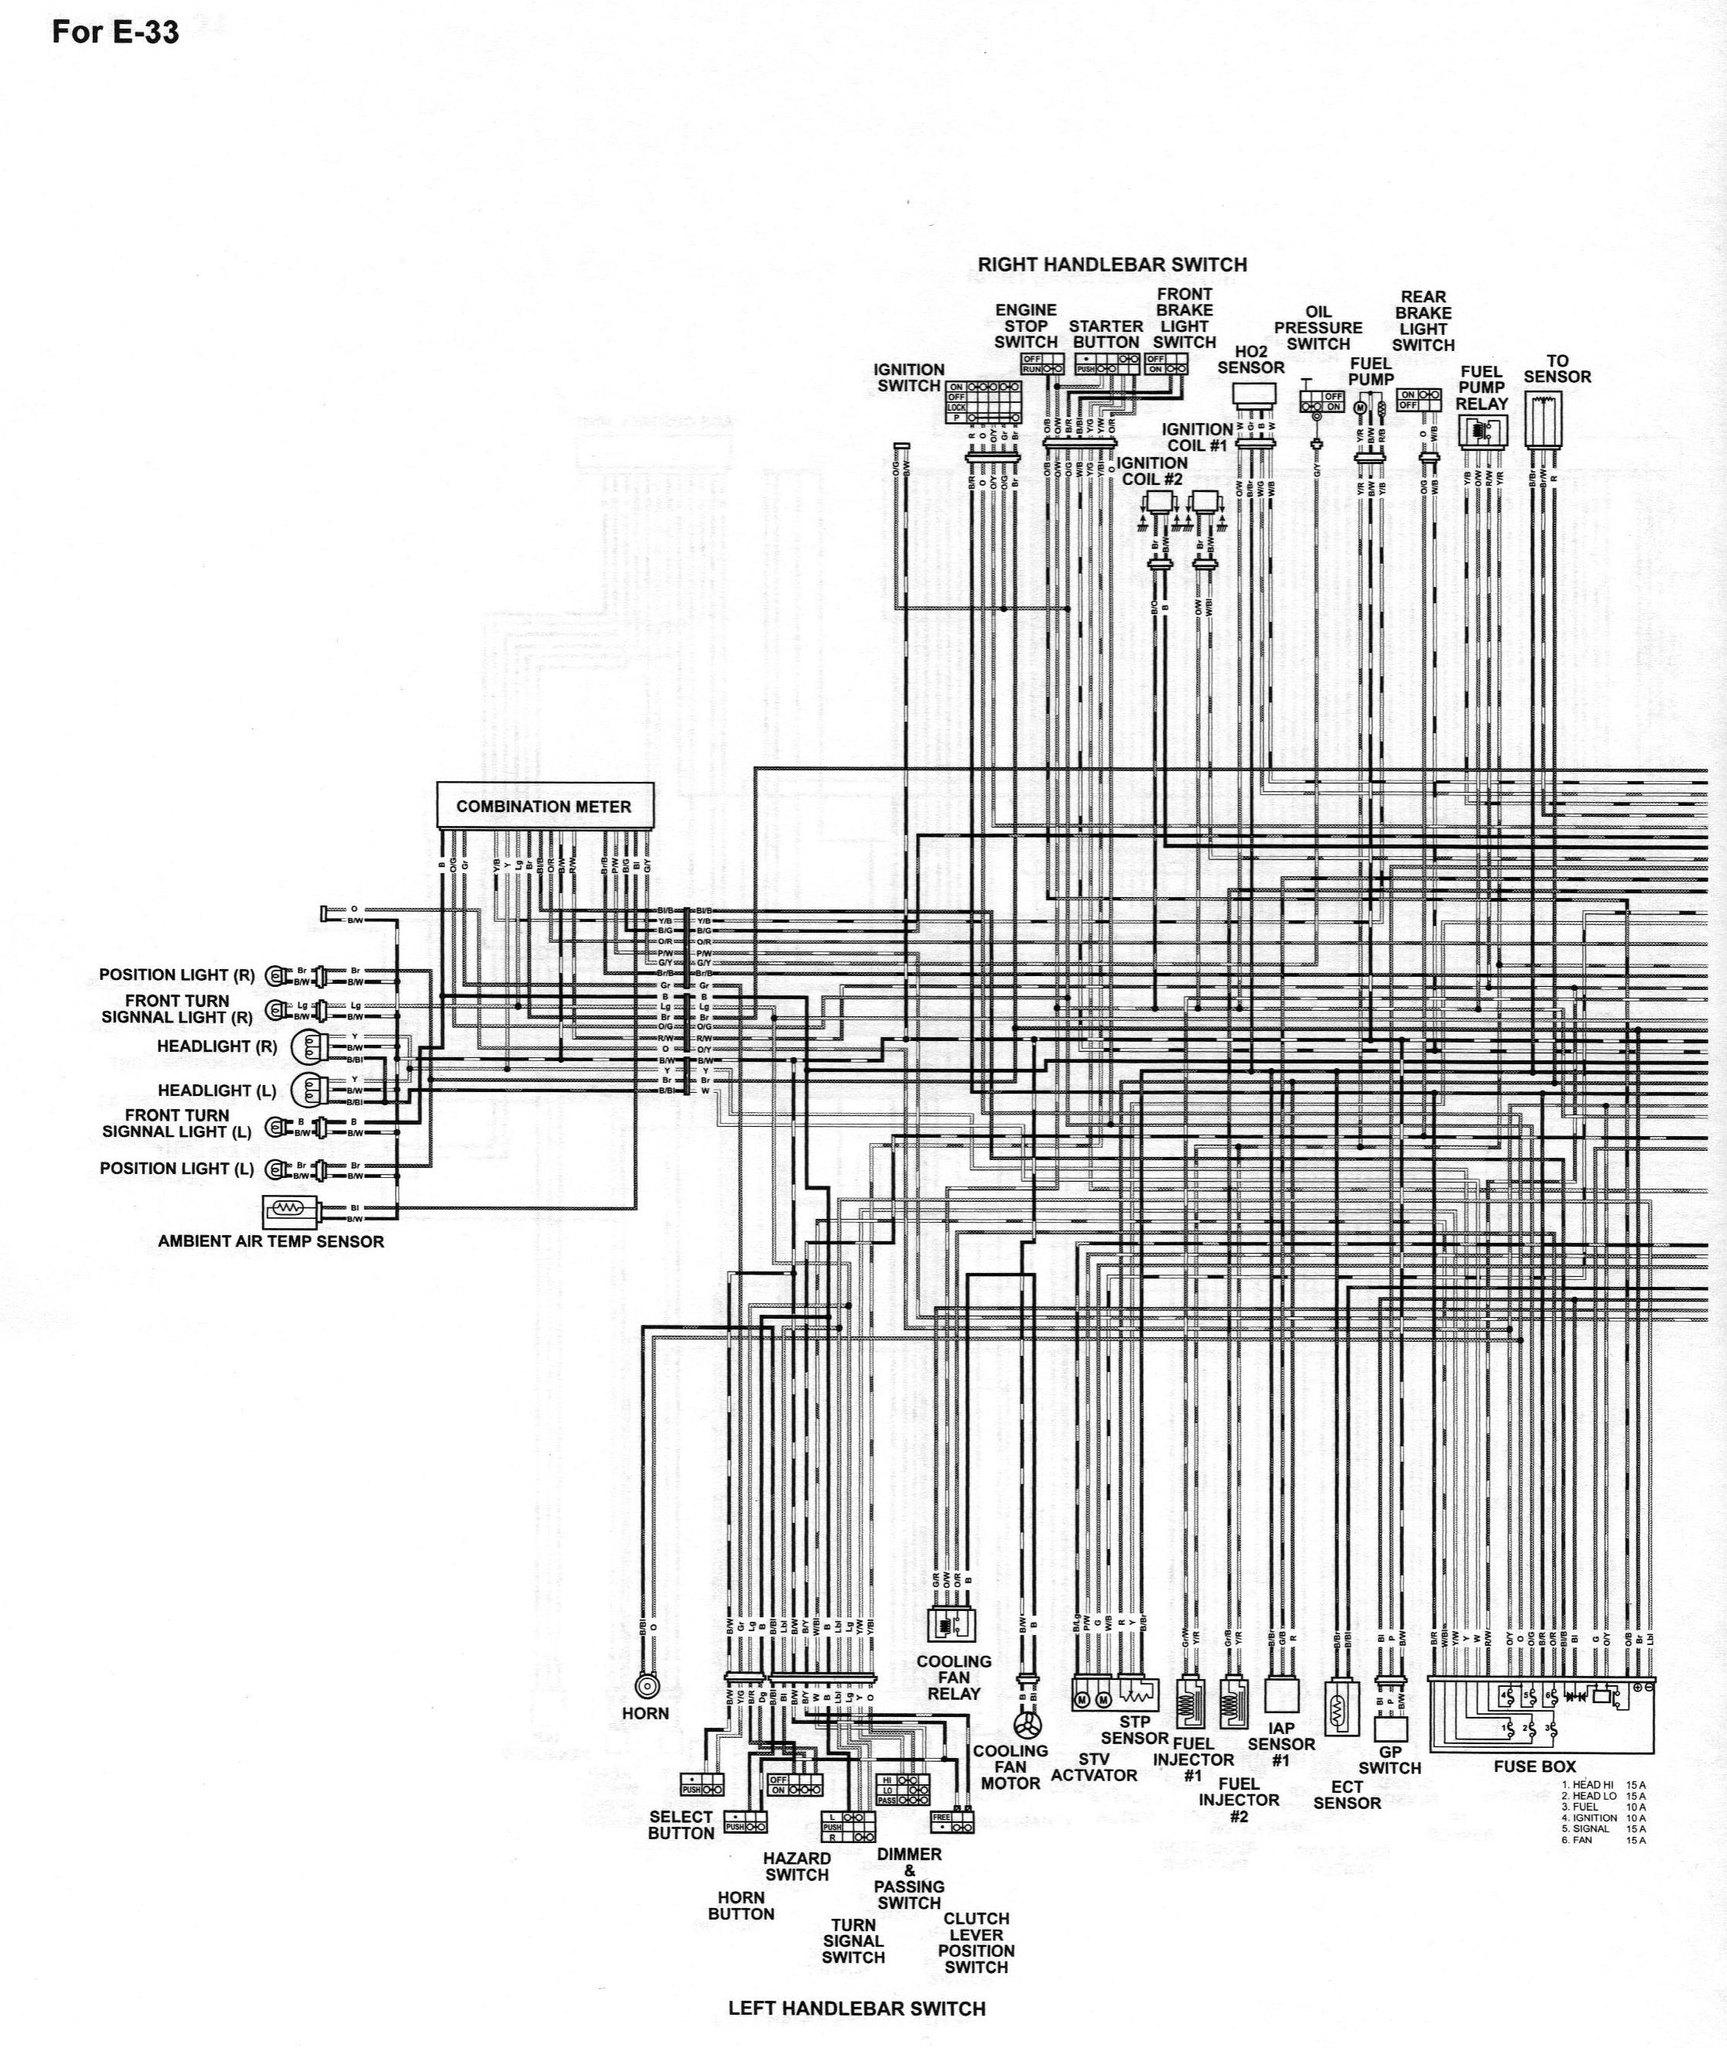 2012 suzuki v strom 650 wiring diagram